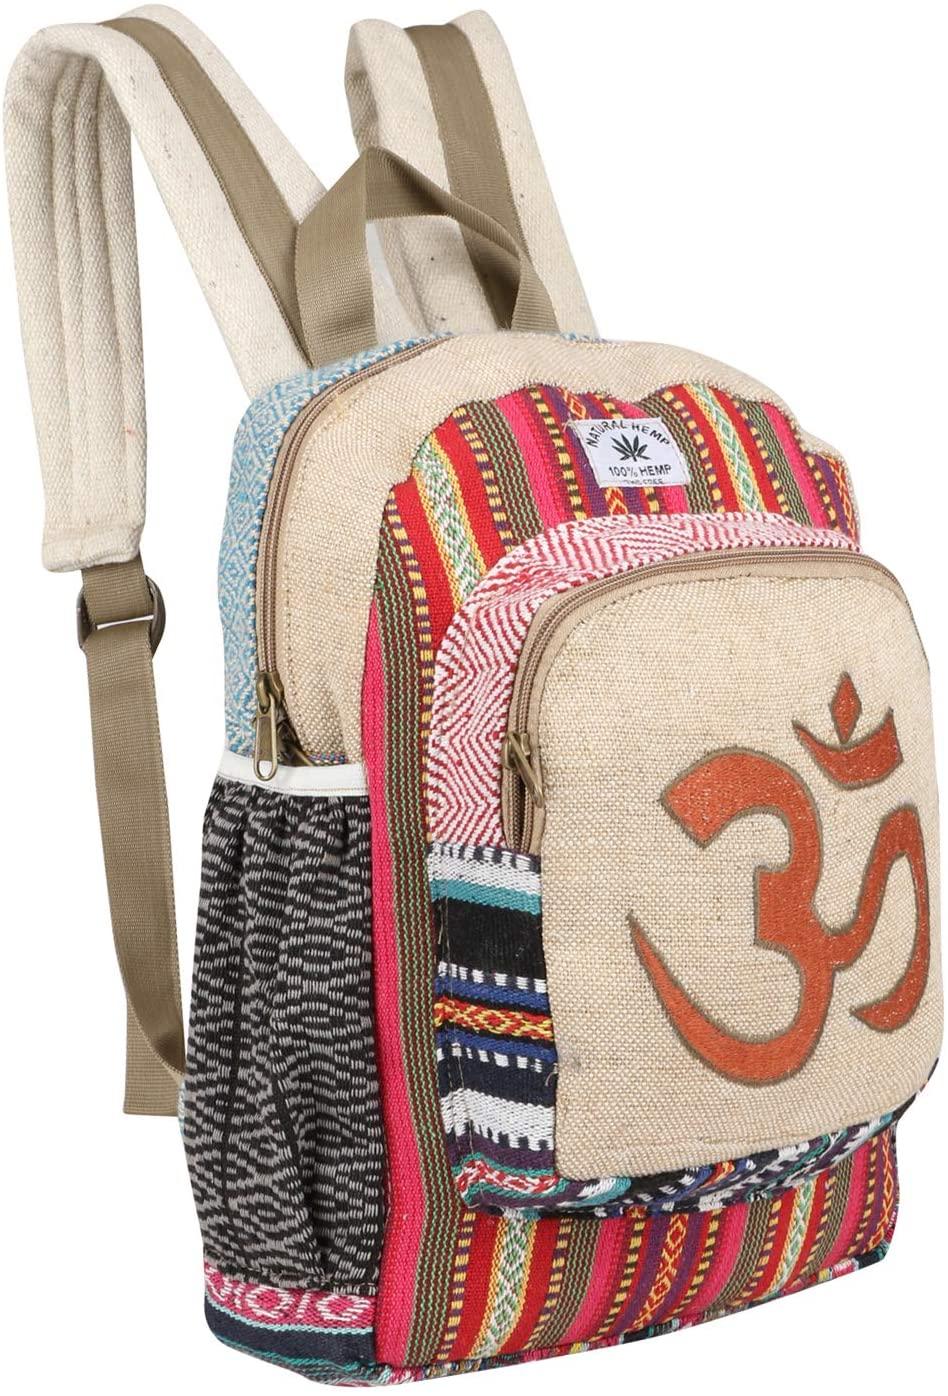 A Cute All Natural Handmade Himalayan Hemp Backpack/Traveler Bag, A Great Product- OM Designed